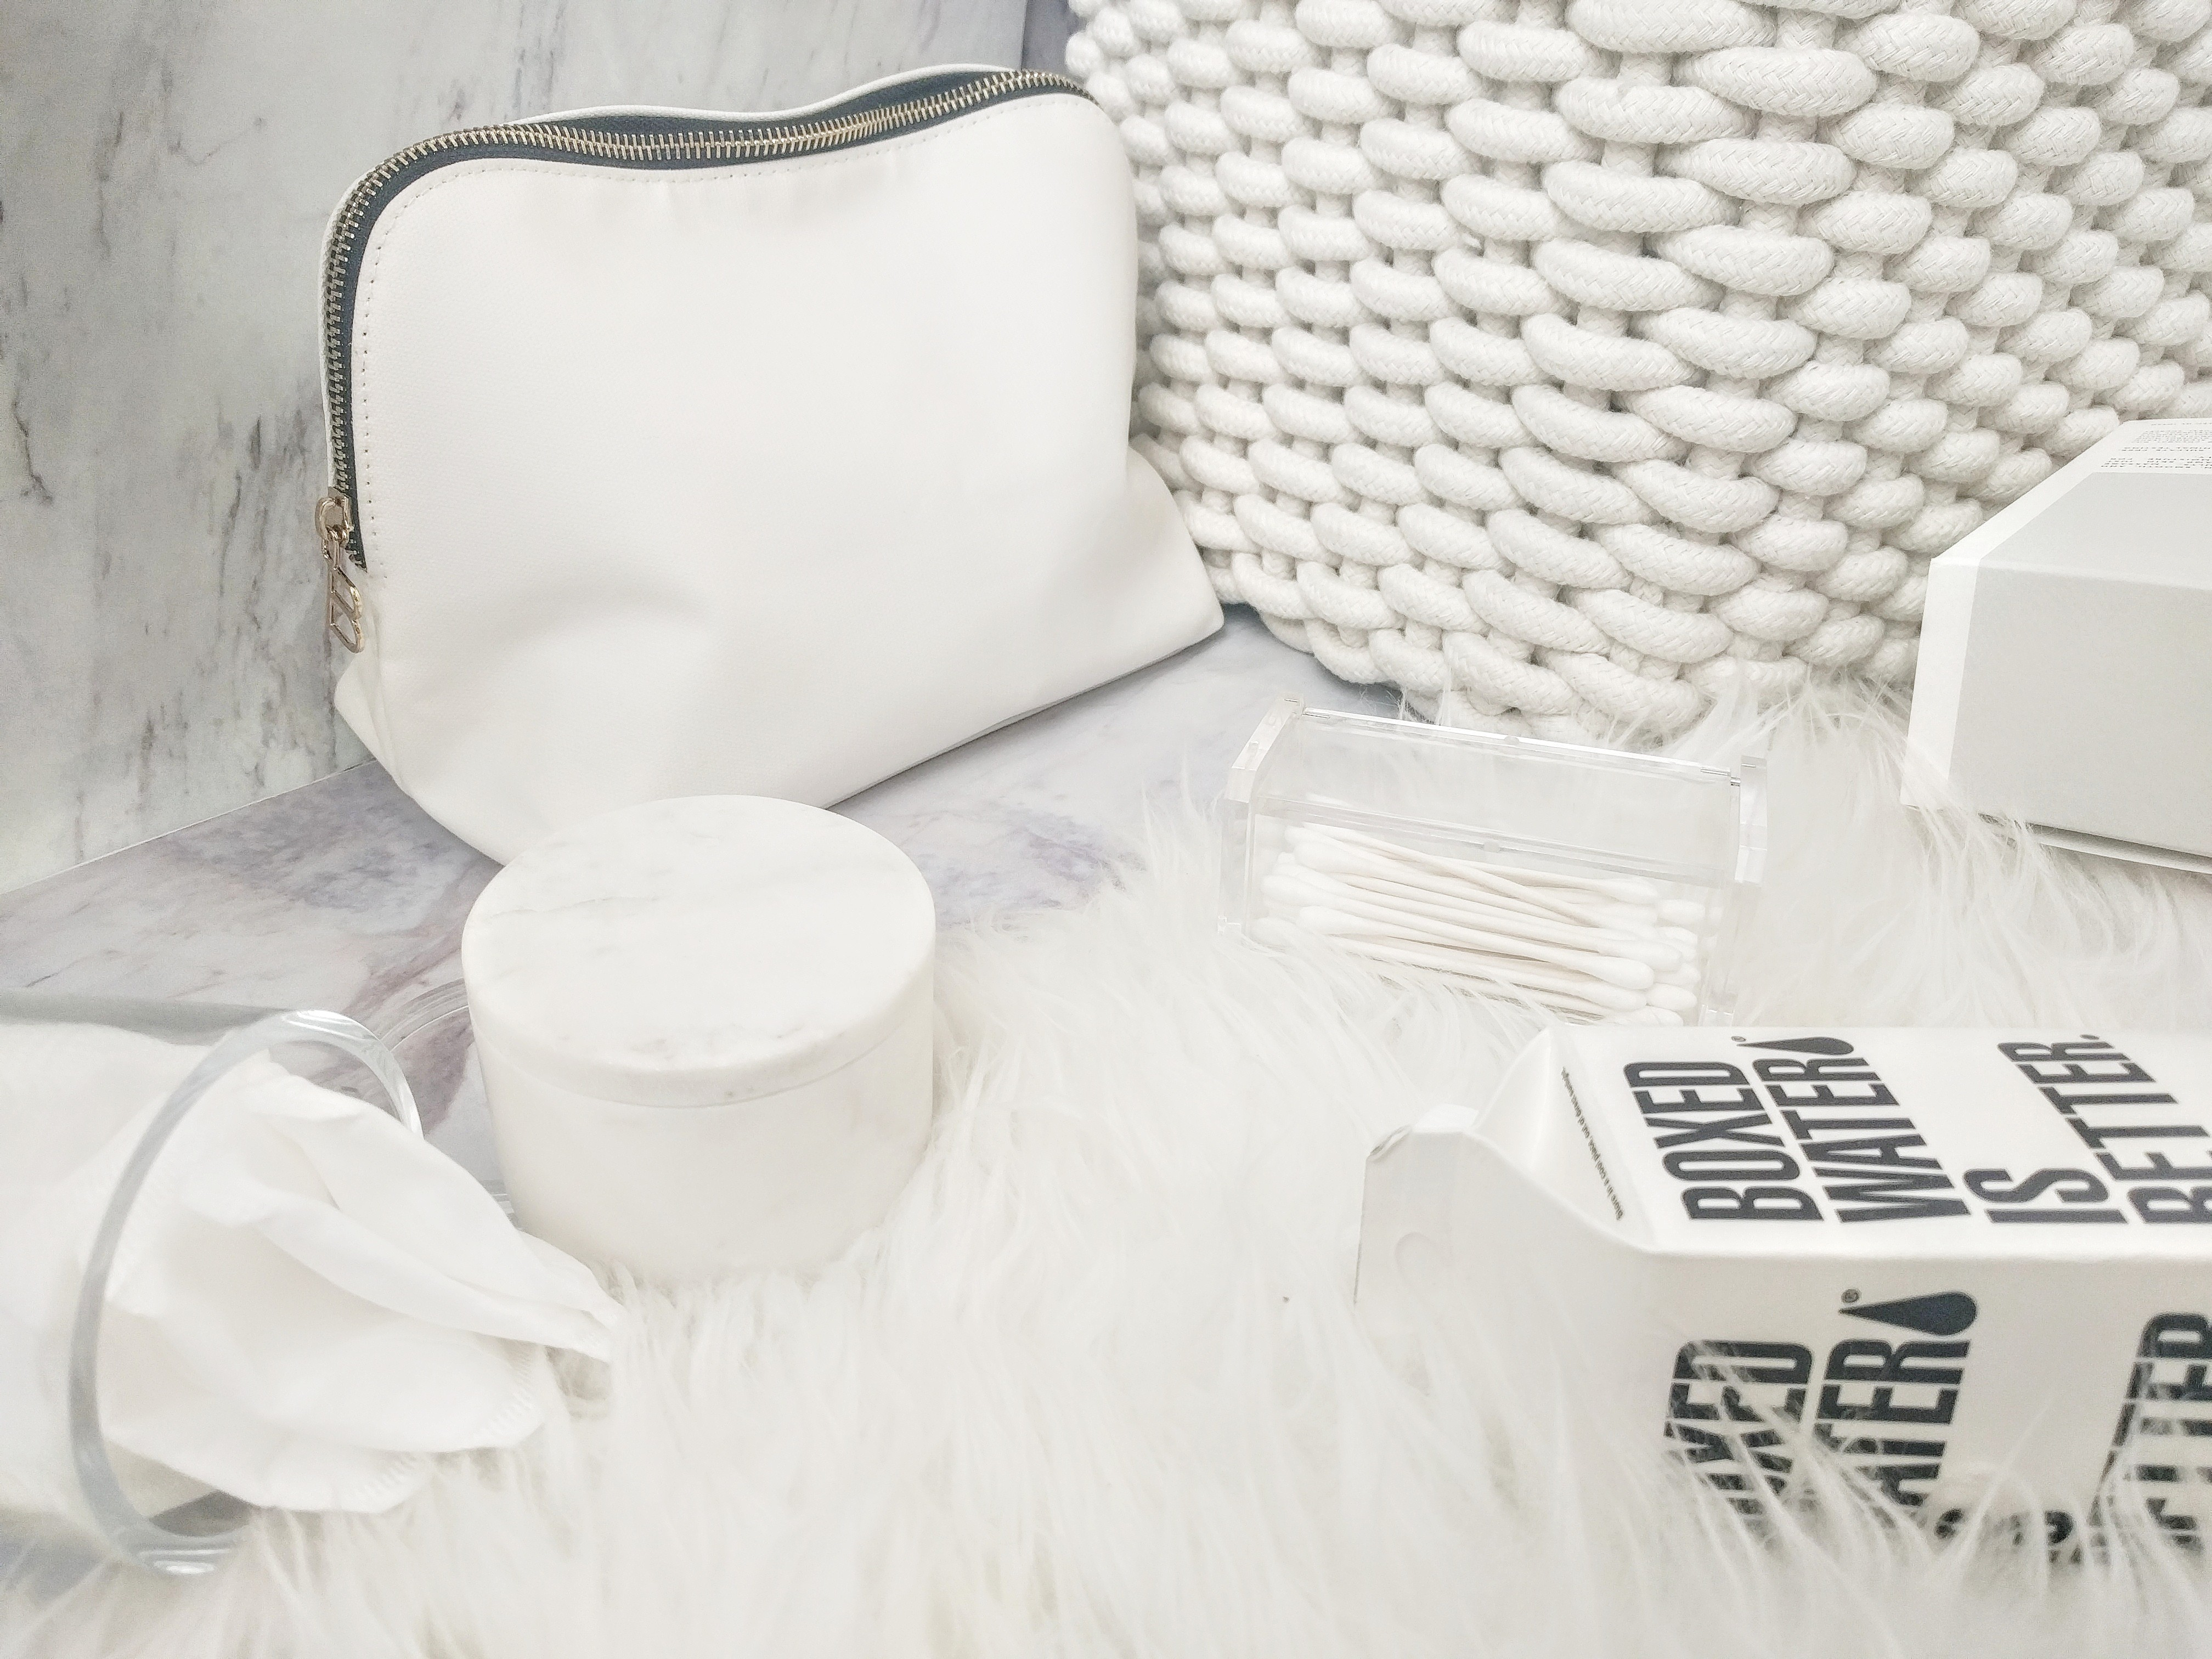 White spa